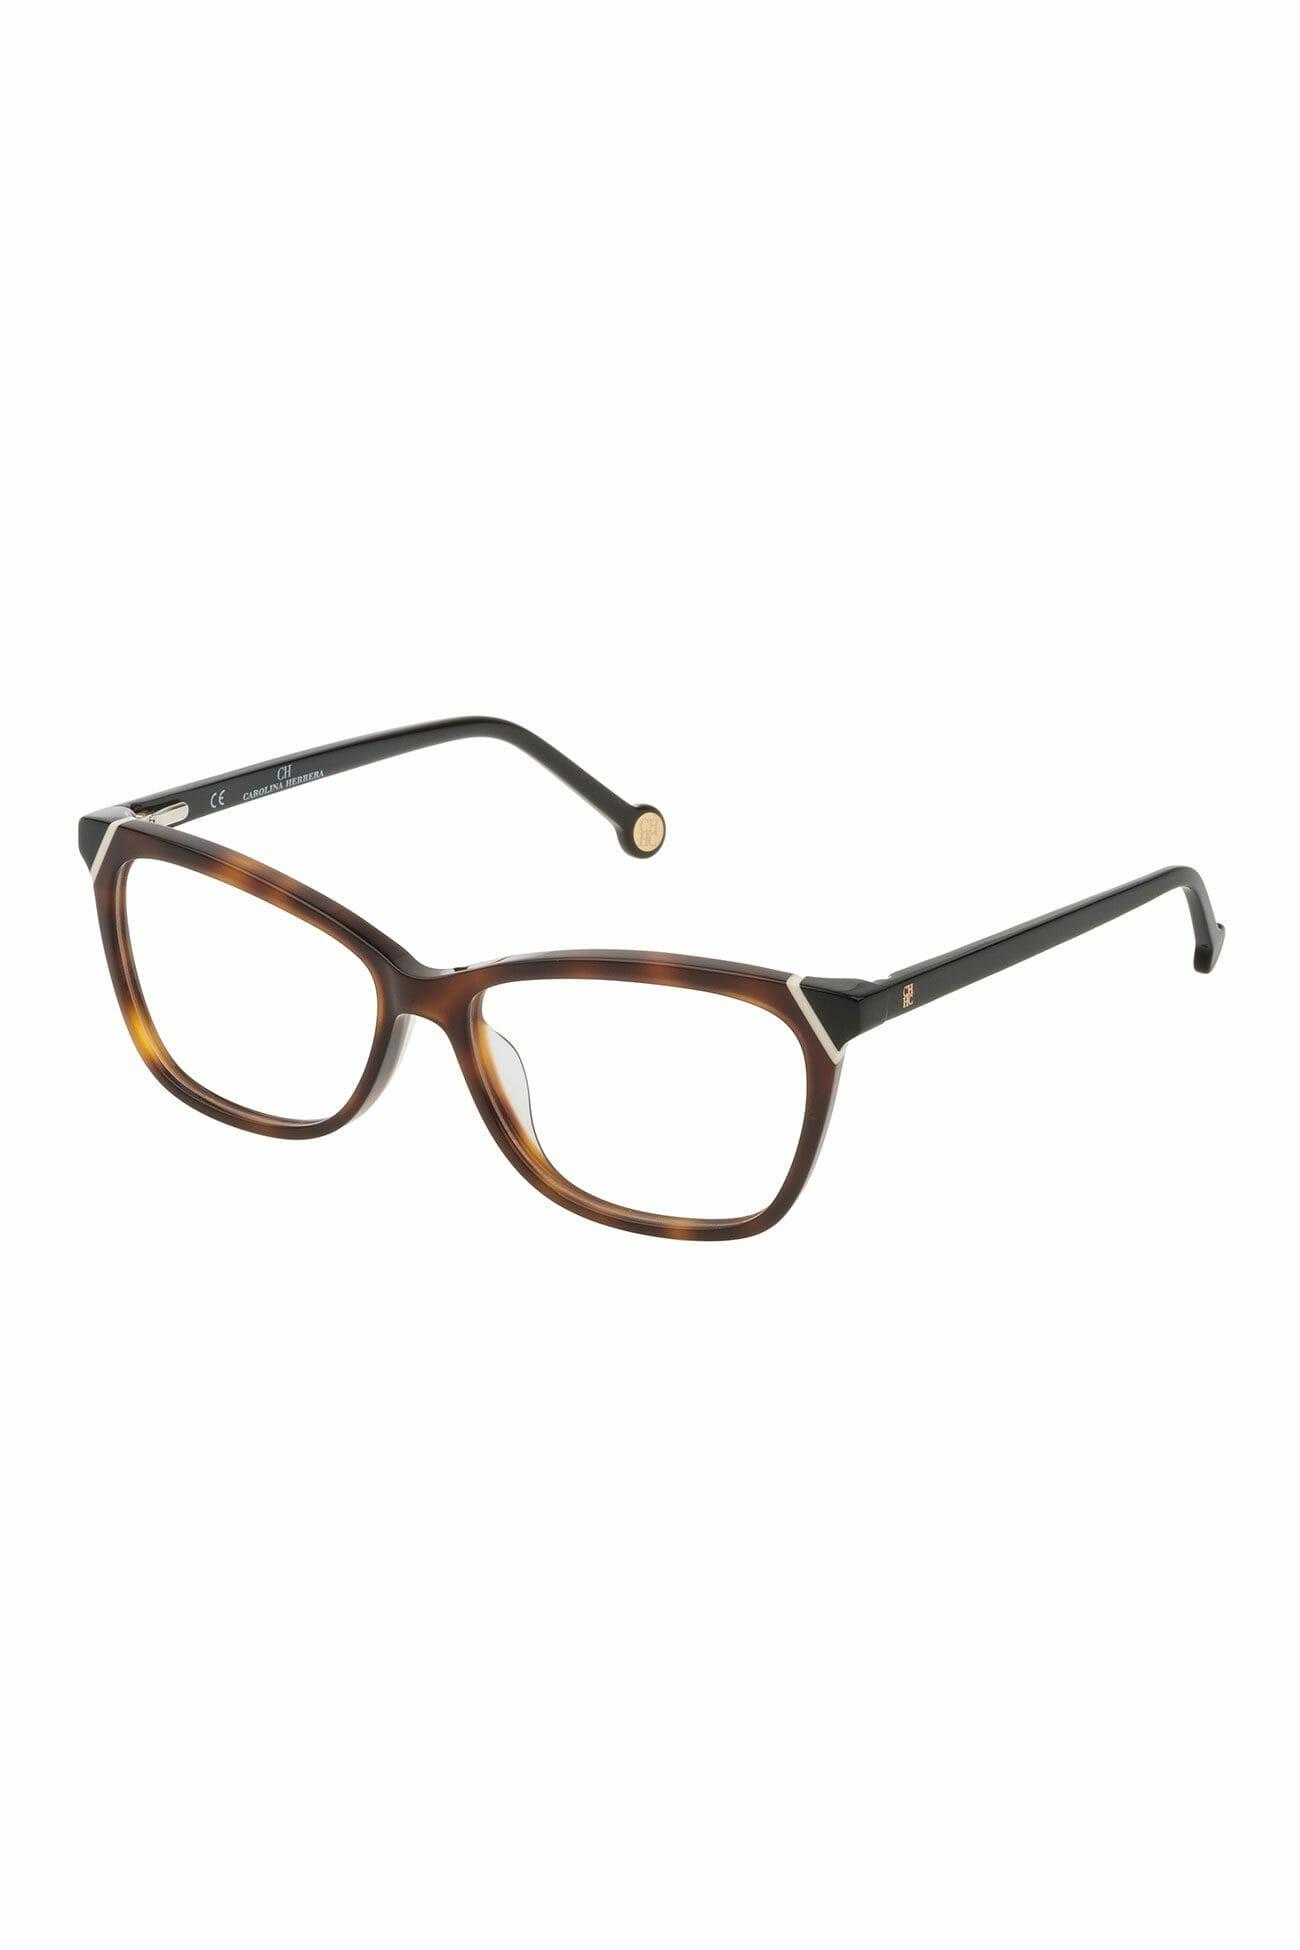 CH-Carolina-Herrera-gafas-óptica-mujer